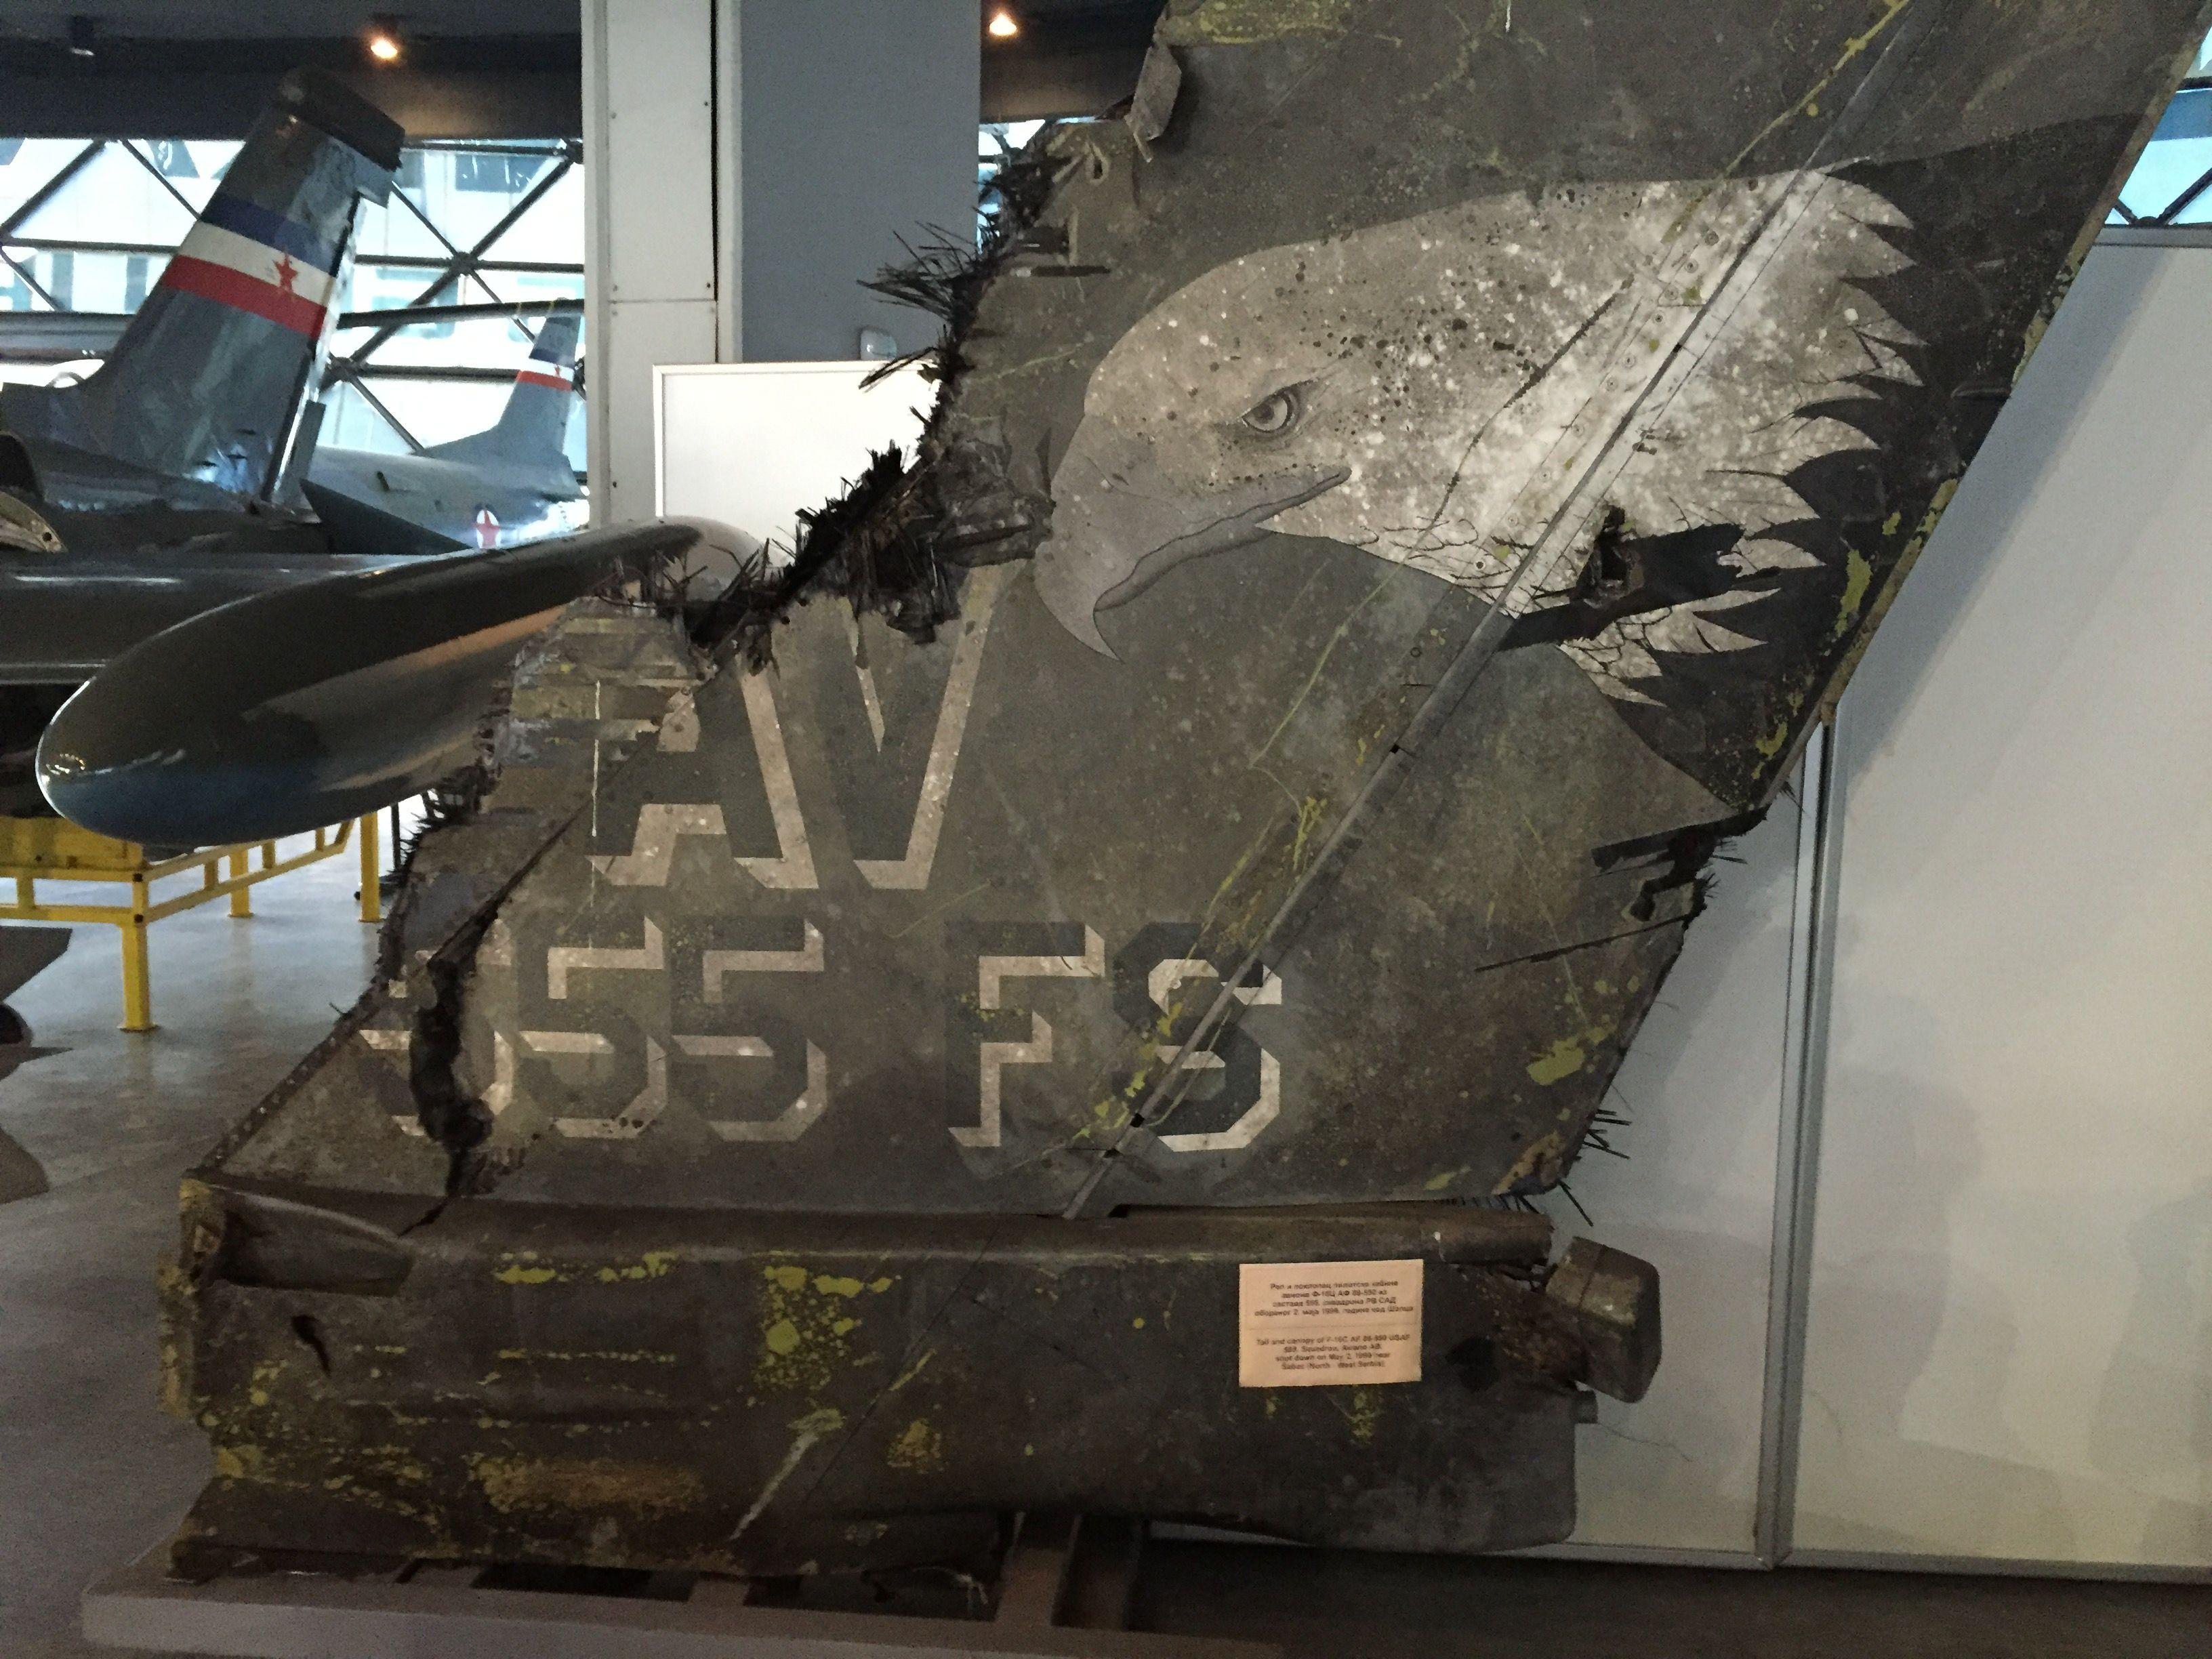 Tail of USAF F16 (shot down on 2 May 1999 near Sabac